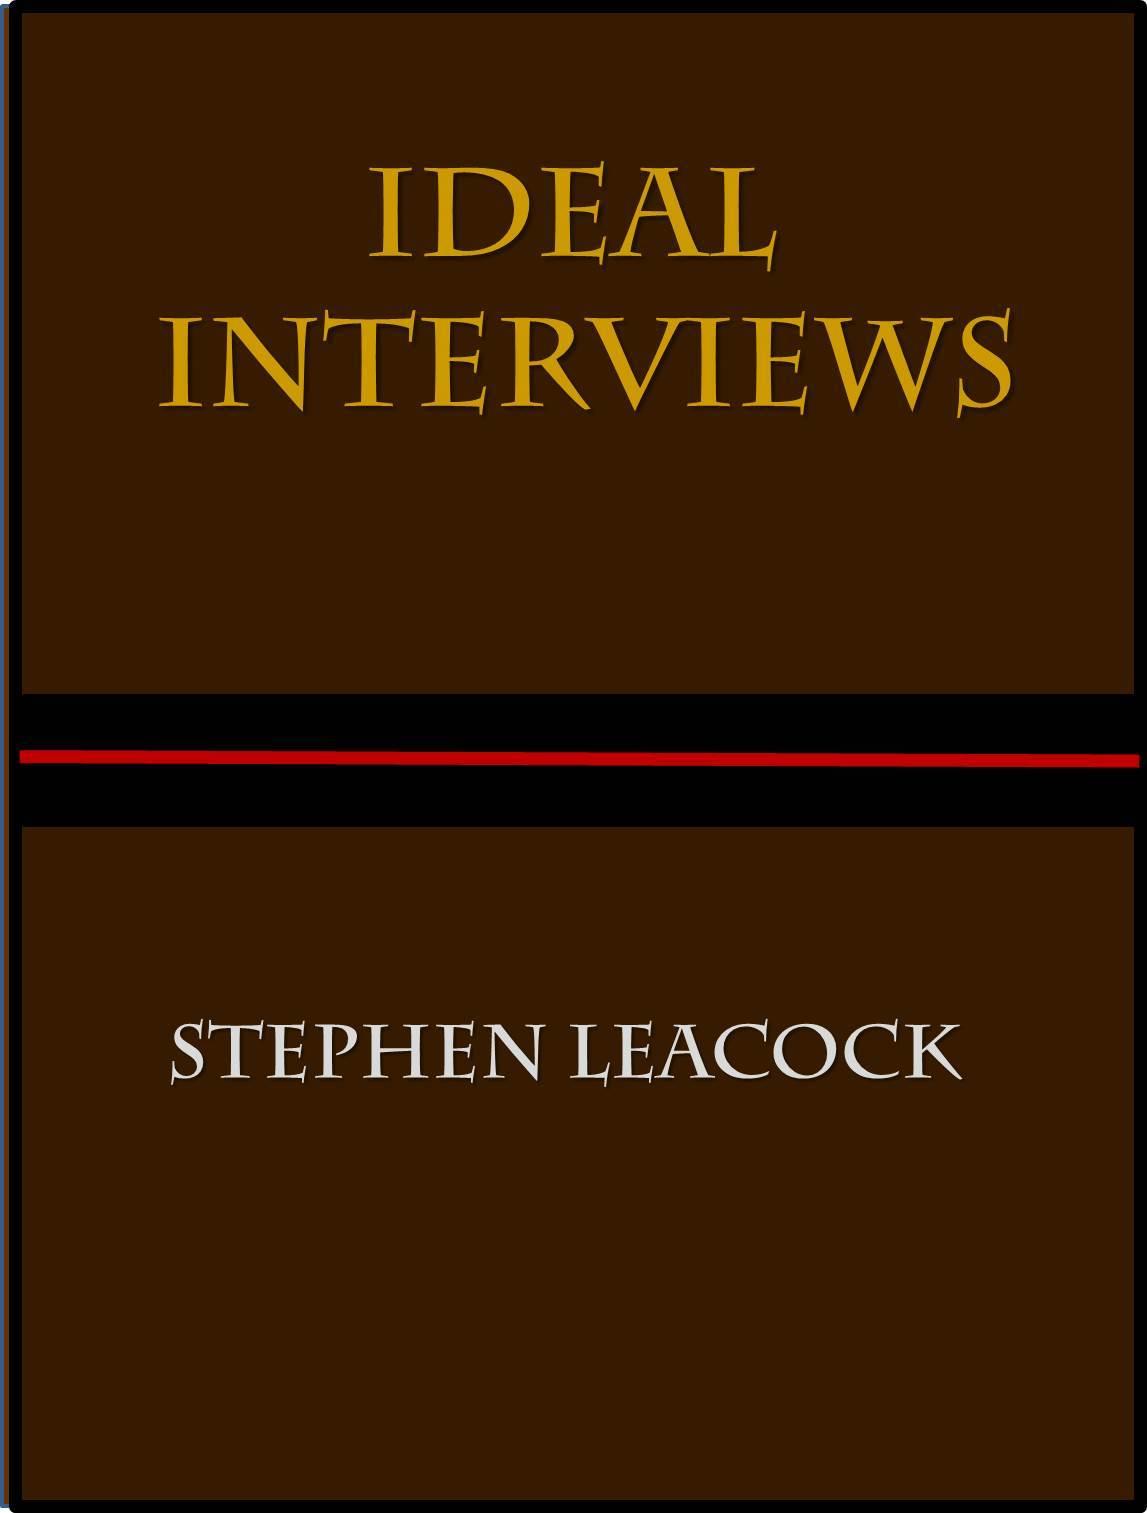 Ideal Interviews Stephen Leacock